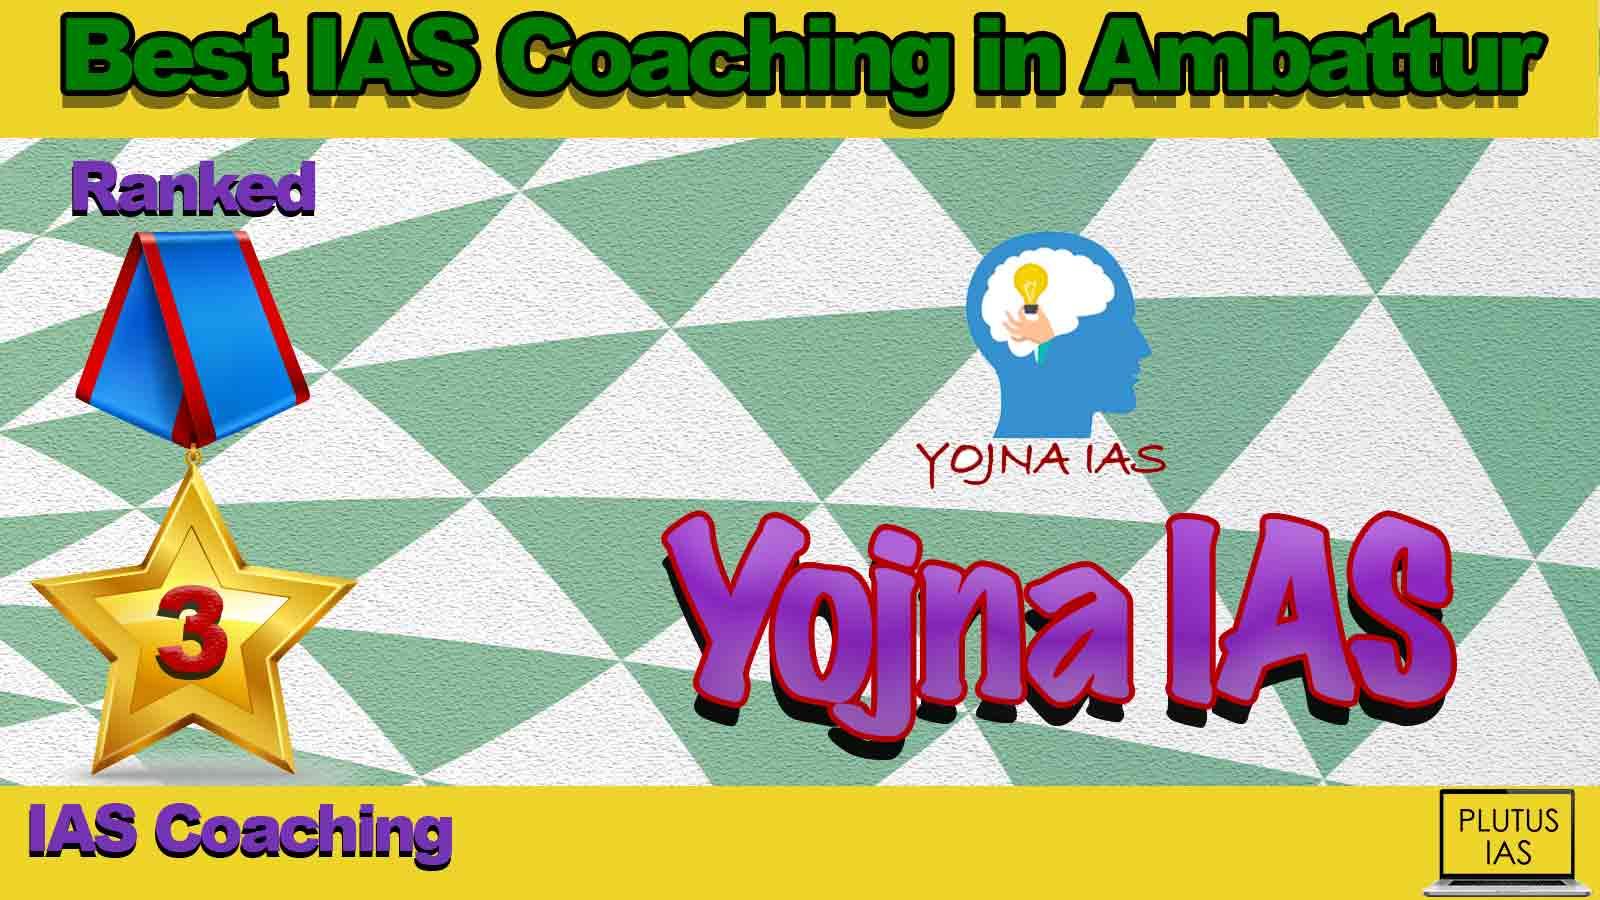 Top IAS Coaching in Ambattur